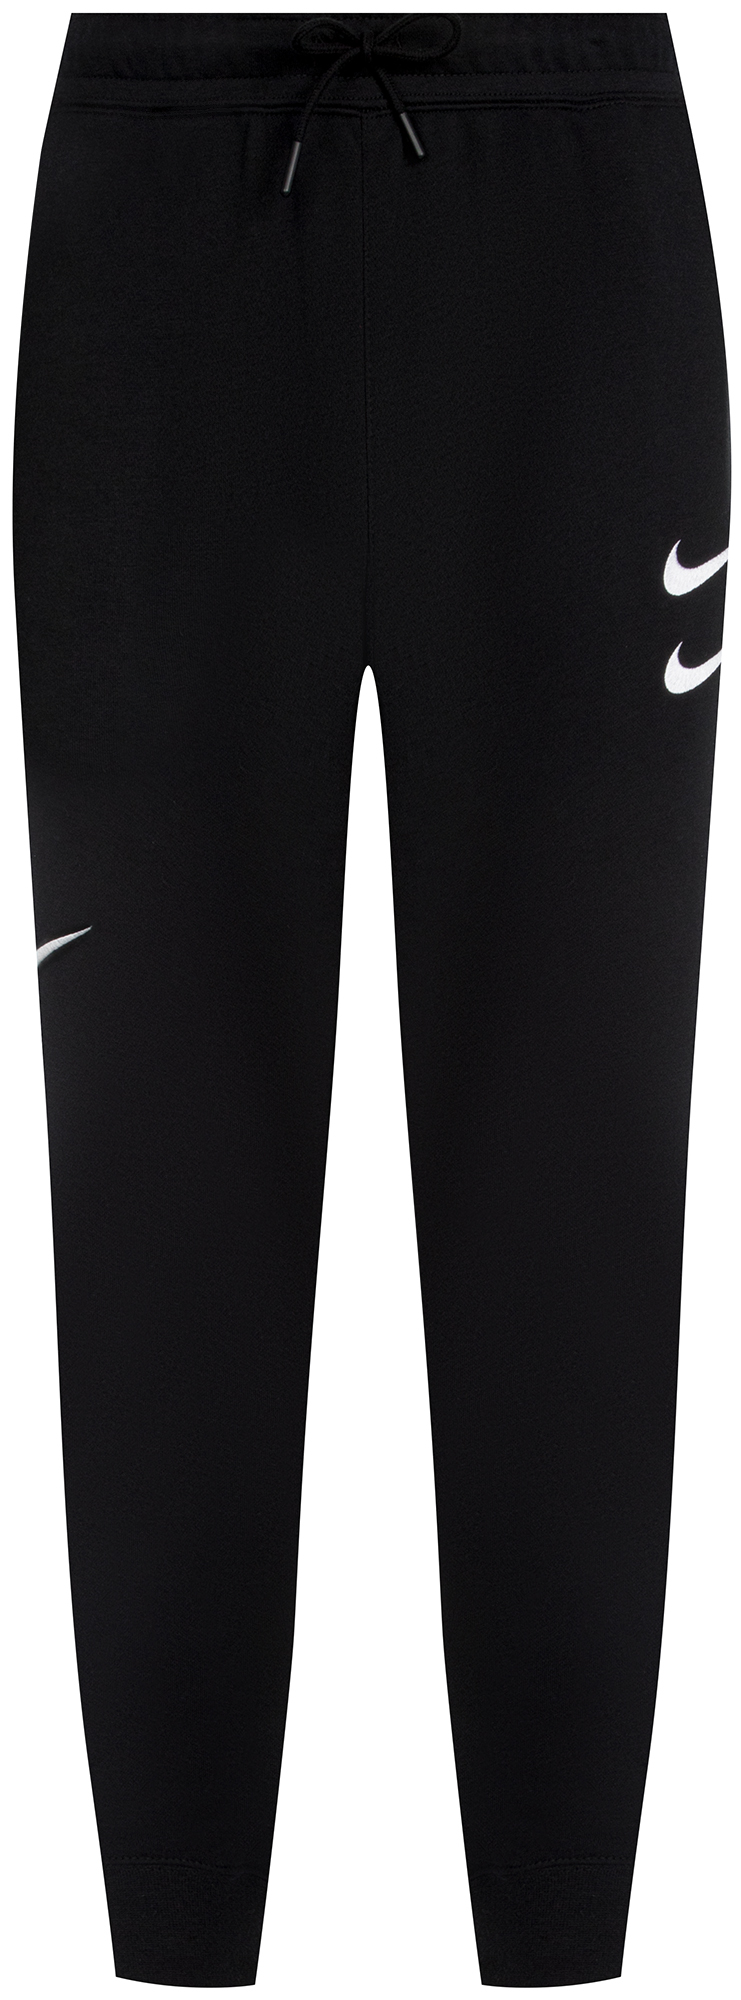 цена Nike Брюки мужские Nike Sportswear Swoosh, размер 44-46 онлайн в 2017 году